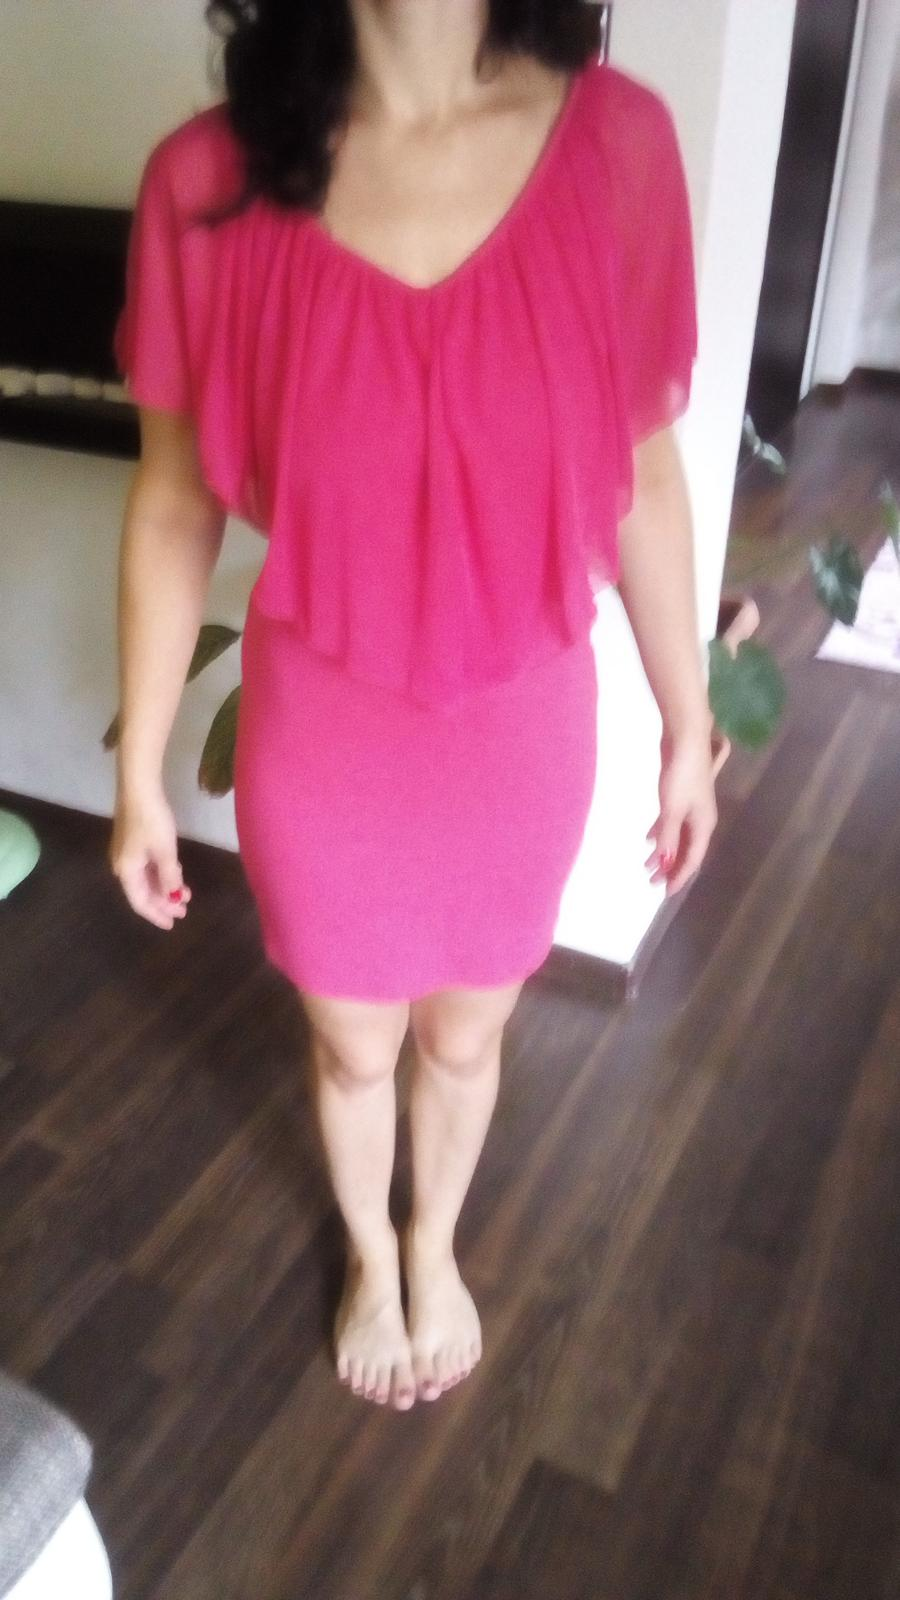 Cyklamenové  šaty Bonprix - Obrázok č. 2